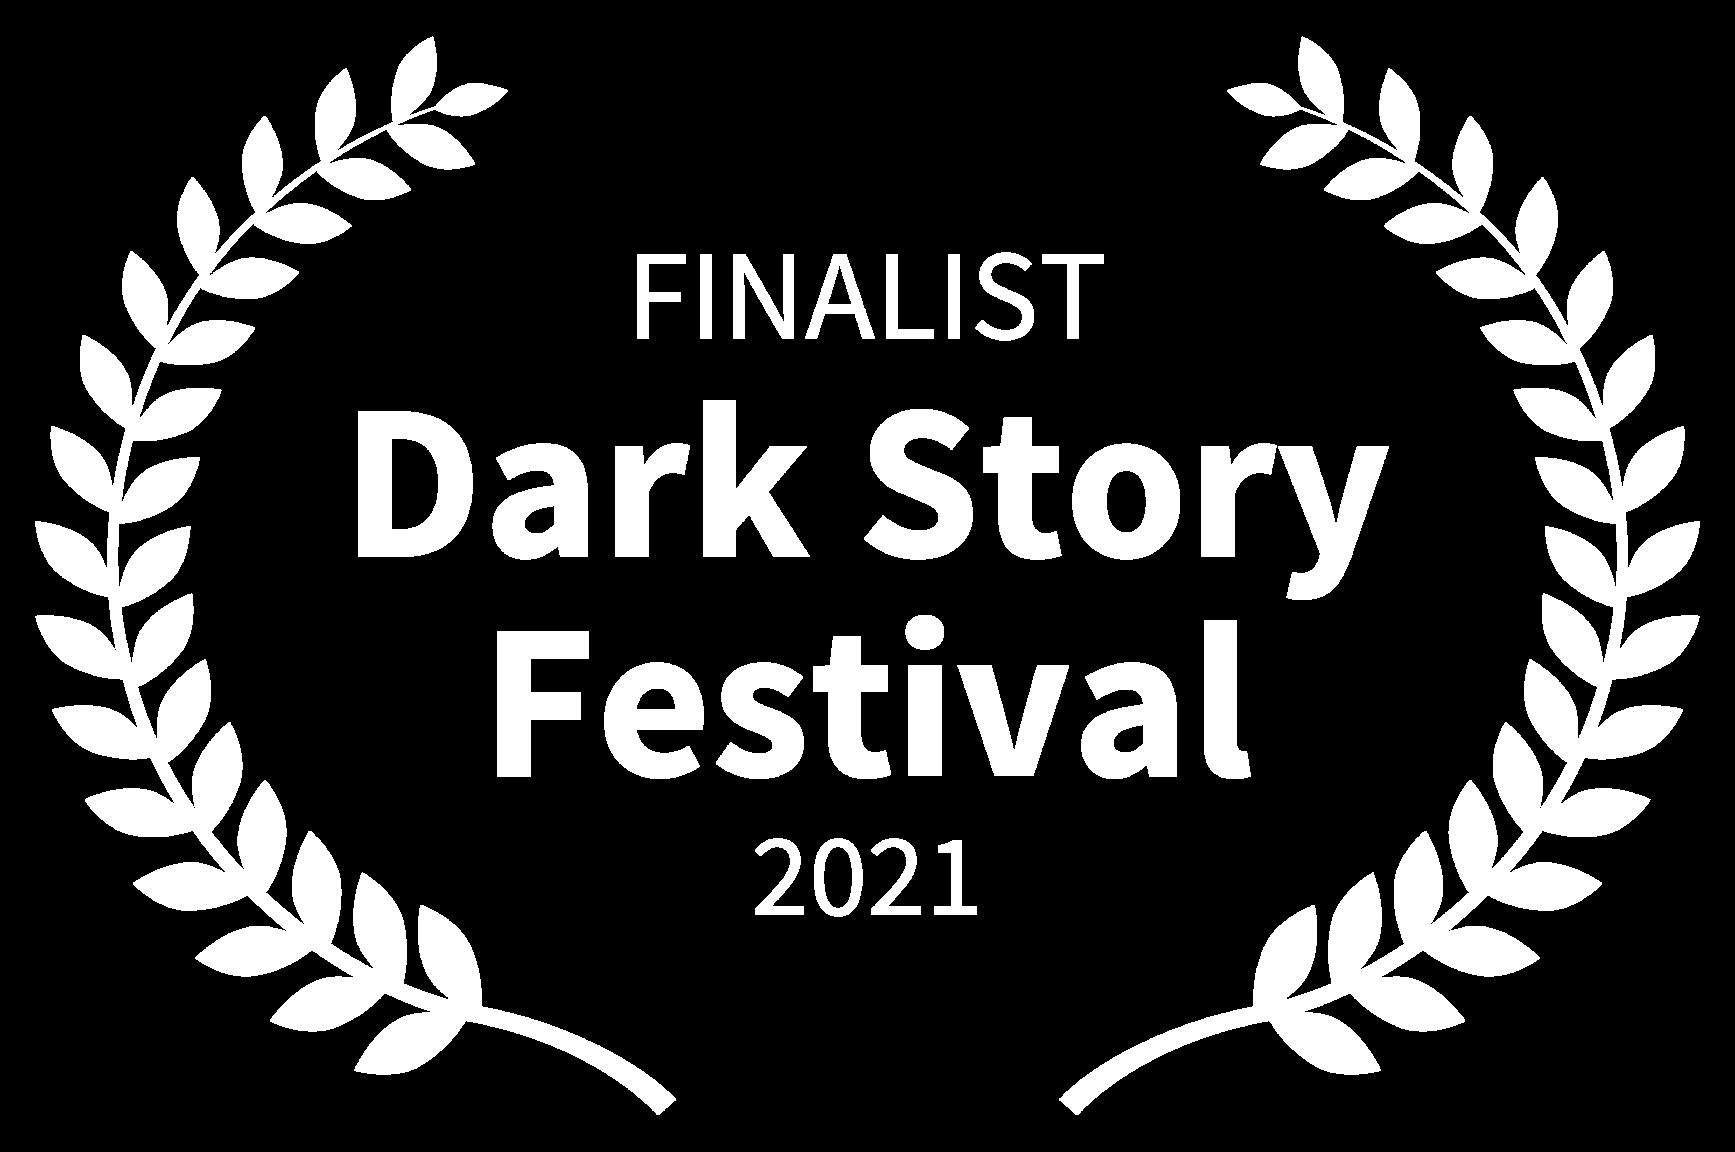 FINALIST - Dark Story Festival - 2021